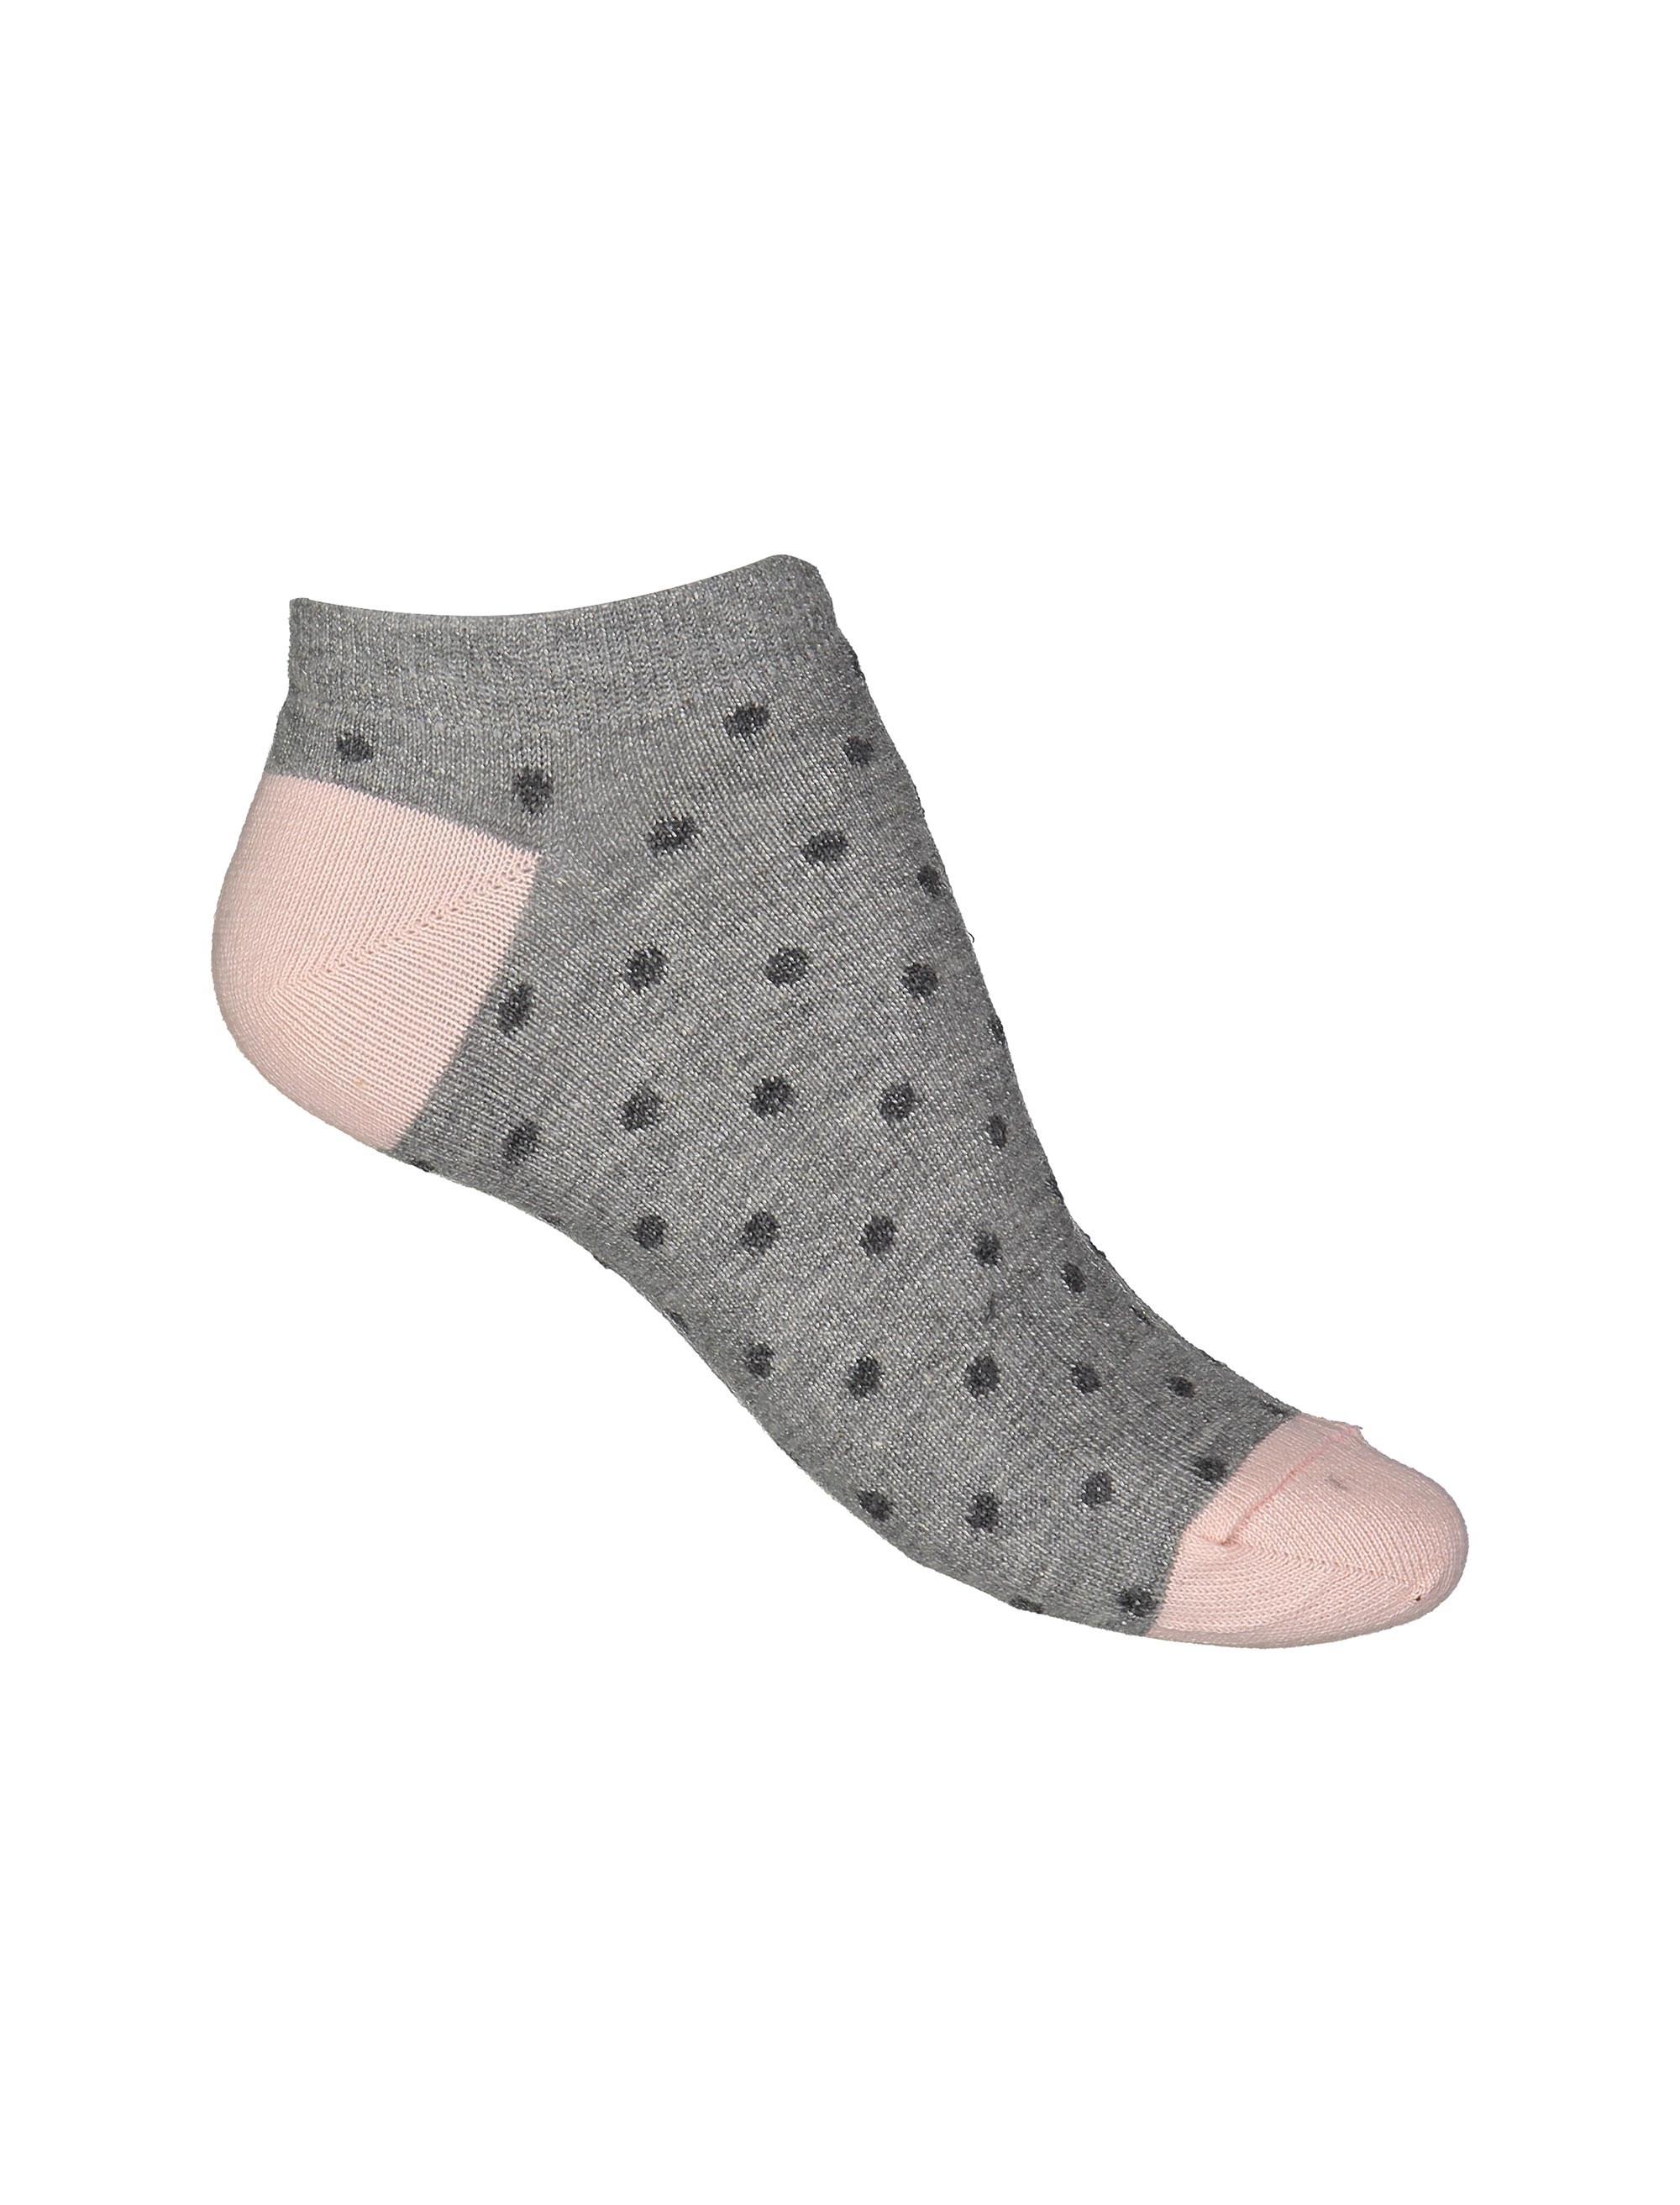 جوراب ساق کوتاه زنانه بسته 3 عددی